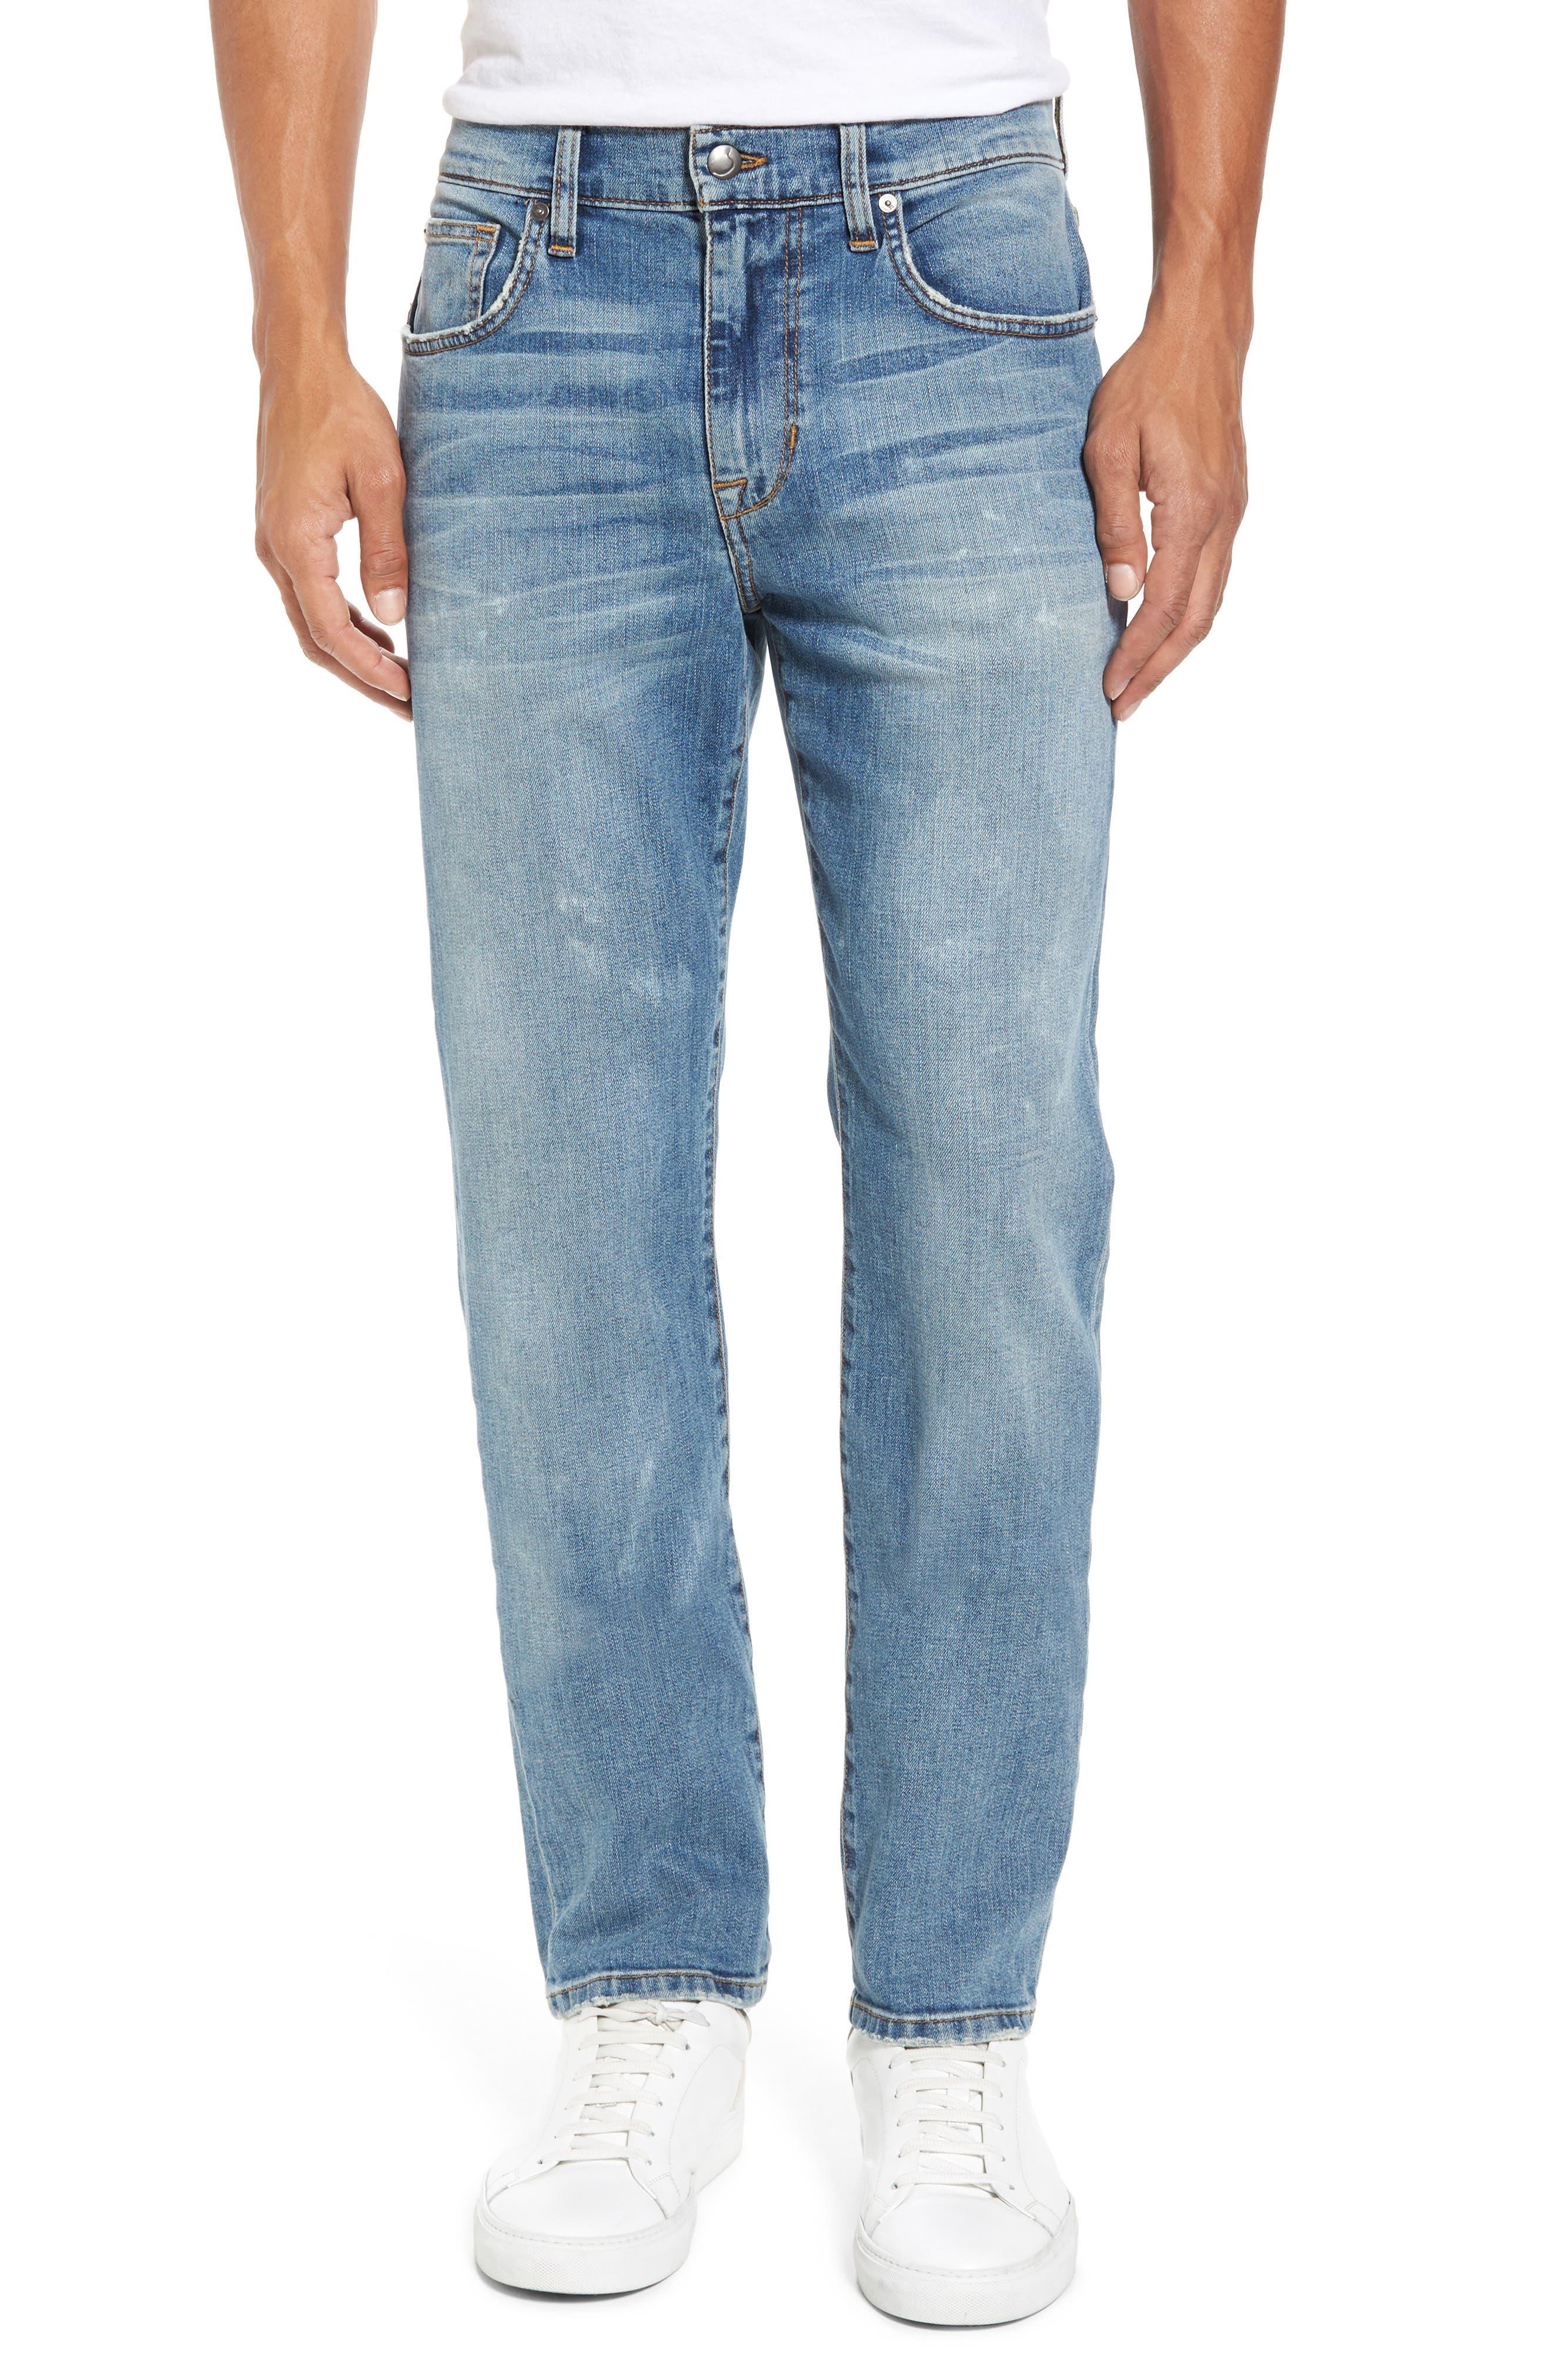 Brixton Slim Straight Fit Jeans,                             Main thumbnail 1, color,                             475